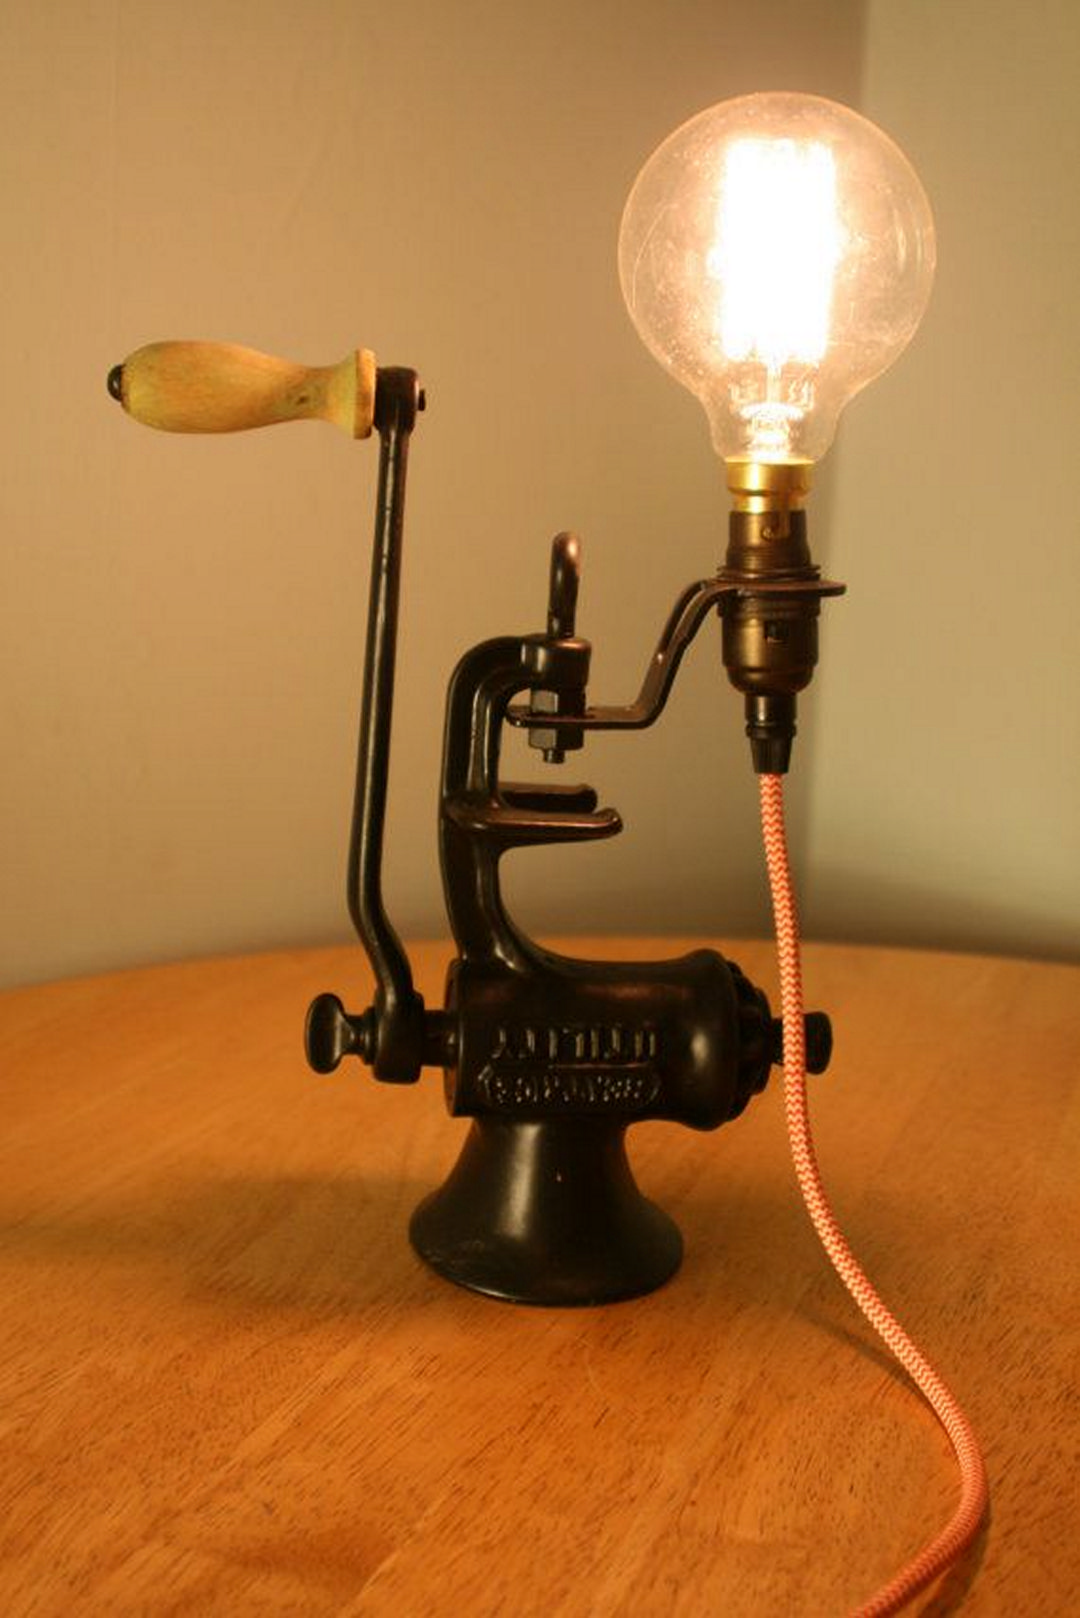 The Herston Self Balancing Desk Lamp Beautifully Designed Delicately Engineered Industrial Lamp Design Vintage Lamps Desk Lamp Design